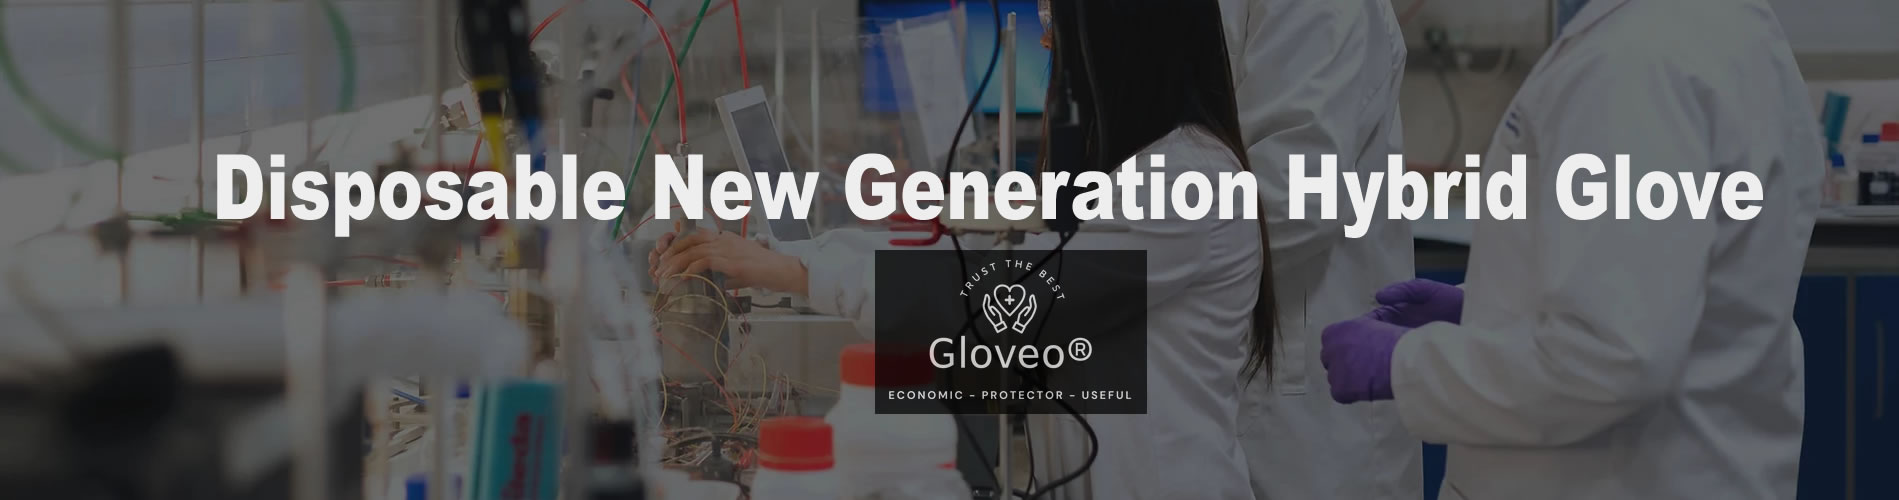 Gloveo Disposable New Generation Hybrid Glove by MARKAP Tekstil ve Danışmanlık A.Ş